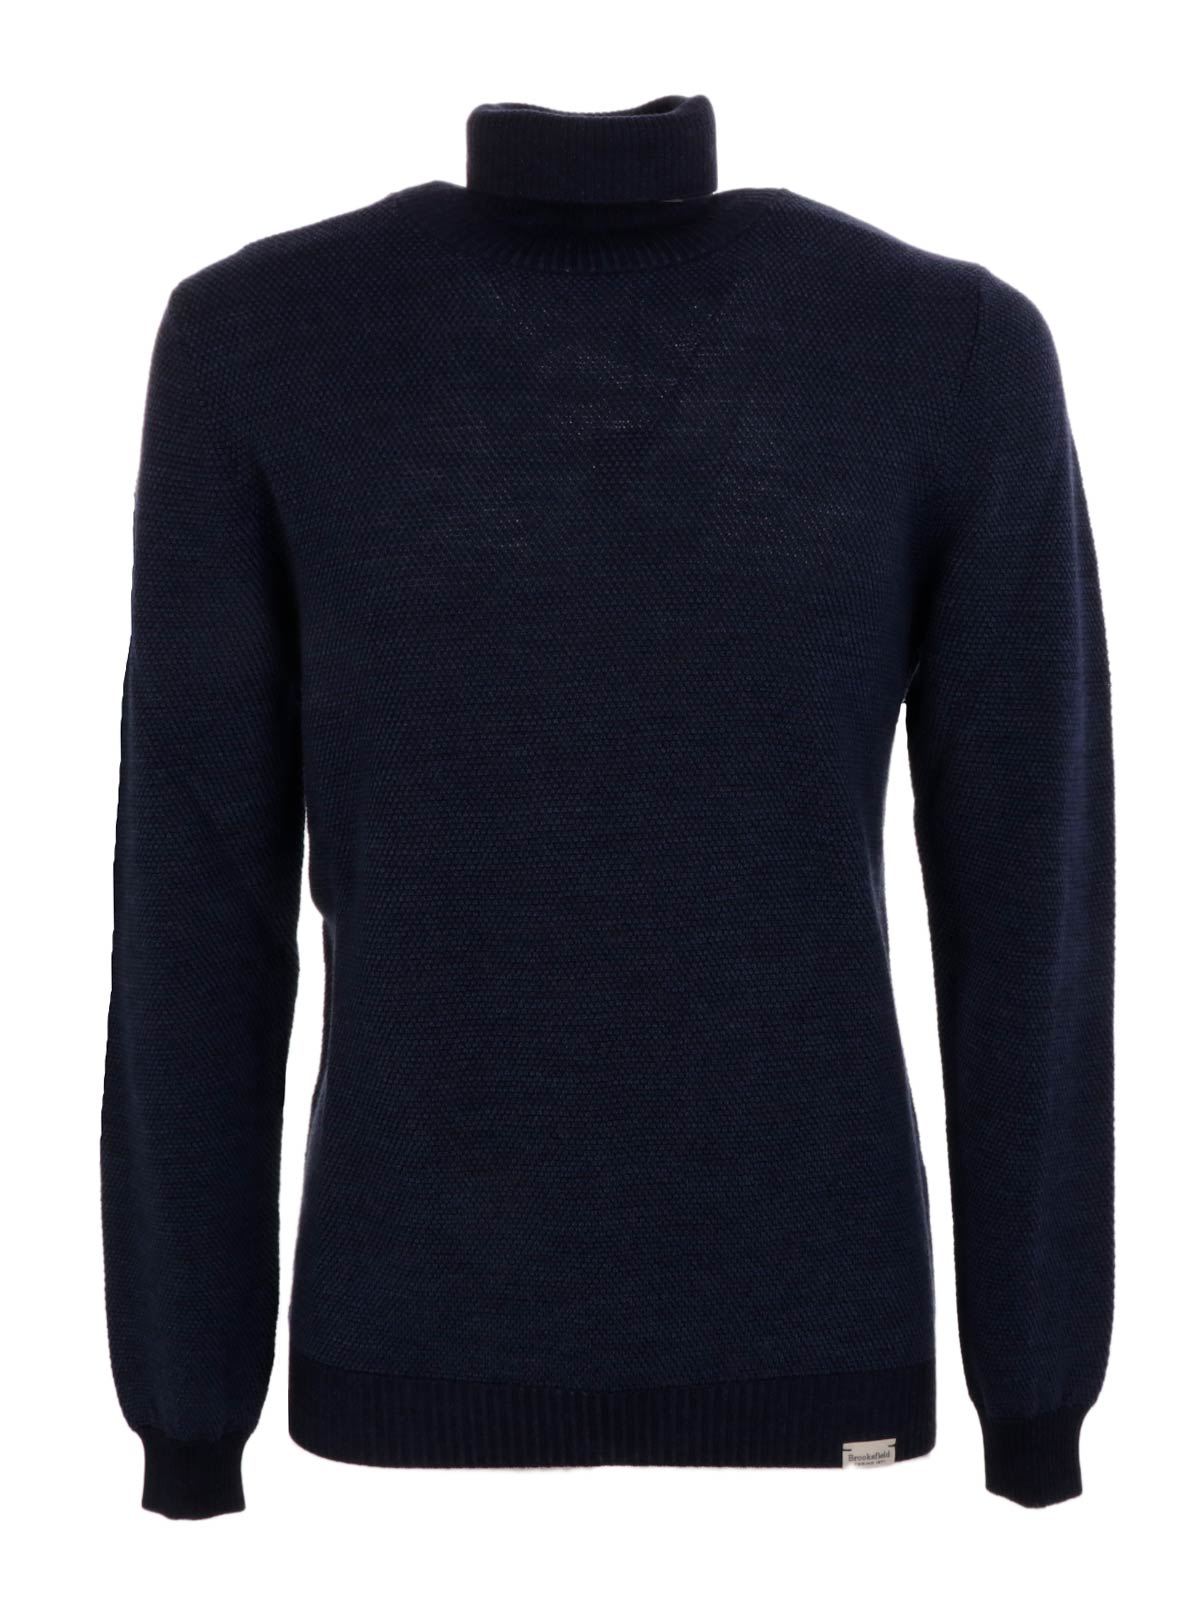 Picture of BROOKSFIELD | Men's Jacquard Turtleneck Sweater